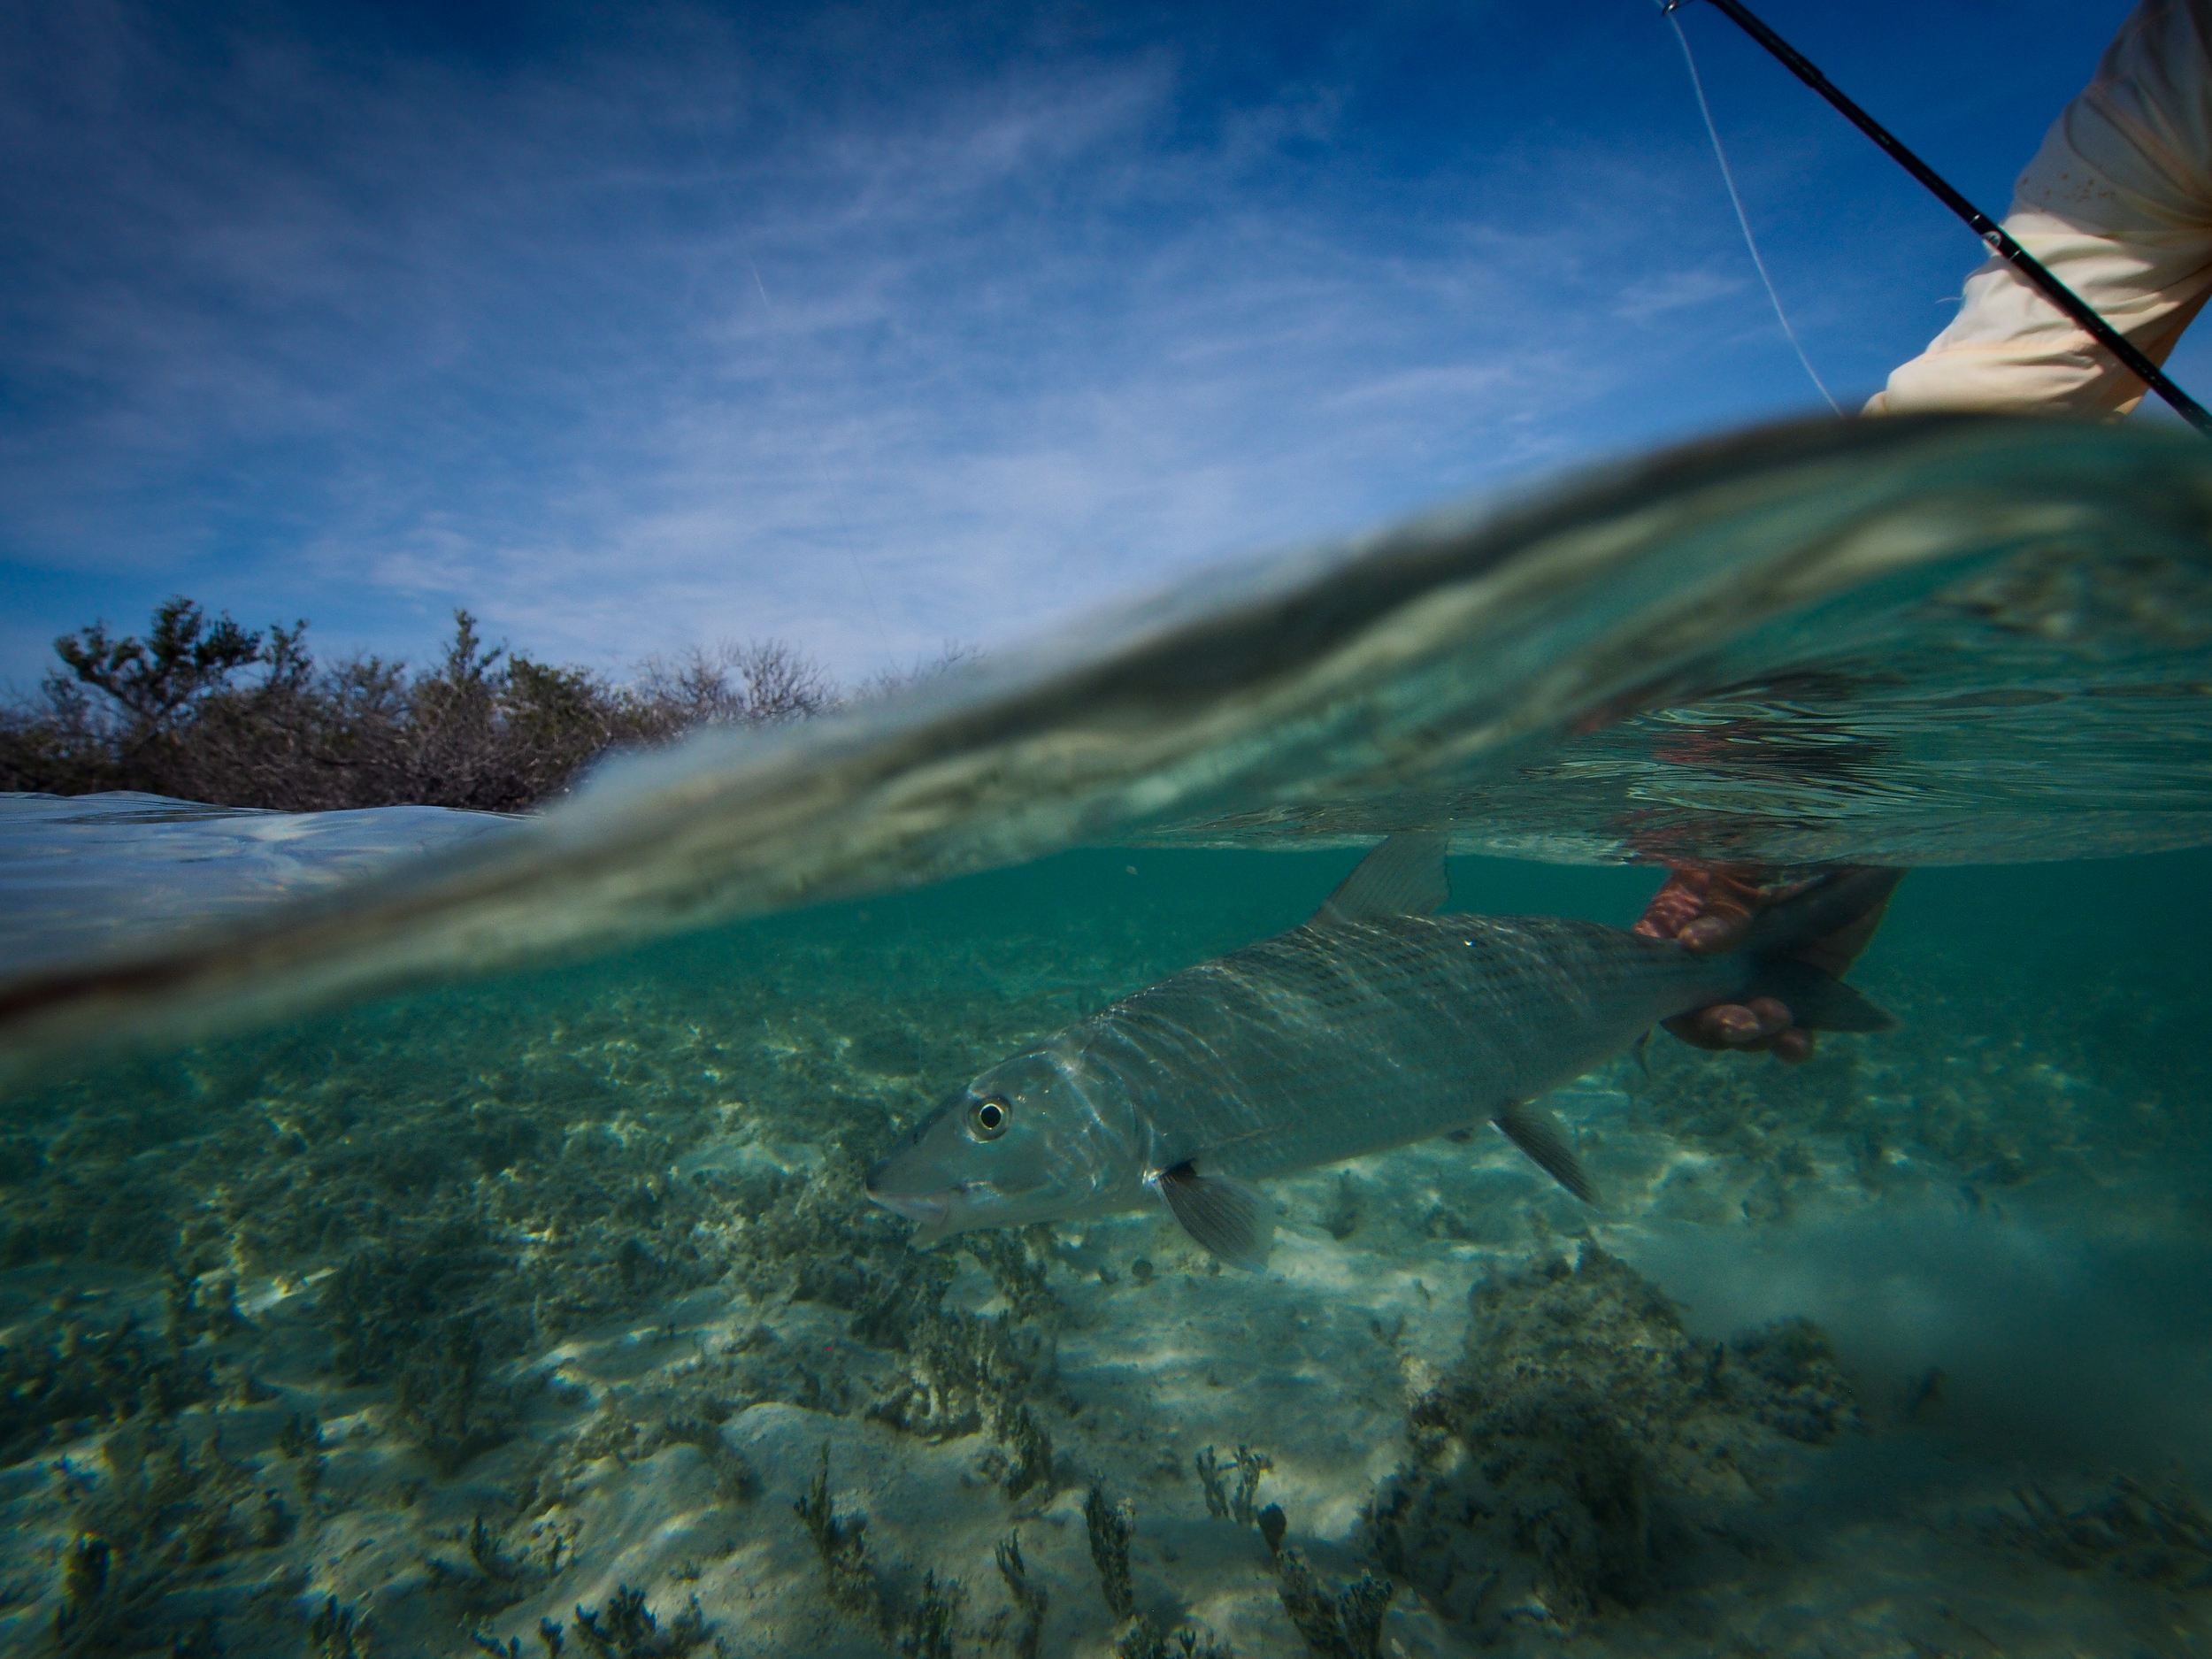 Fly fishing for Bonefish at Jardines de la Reina, Cuba